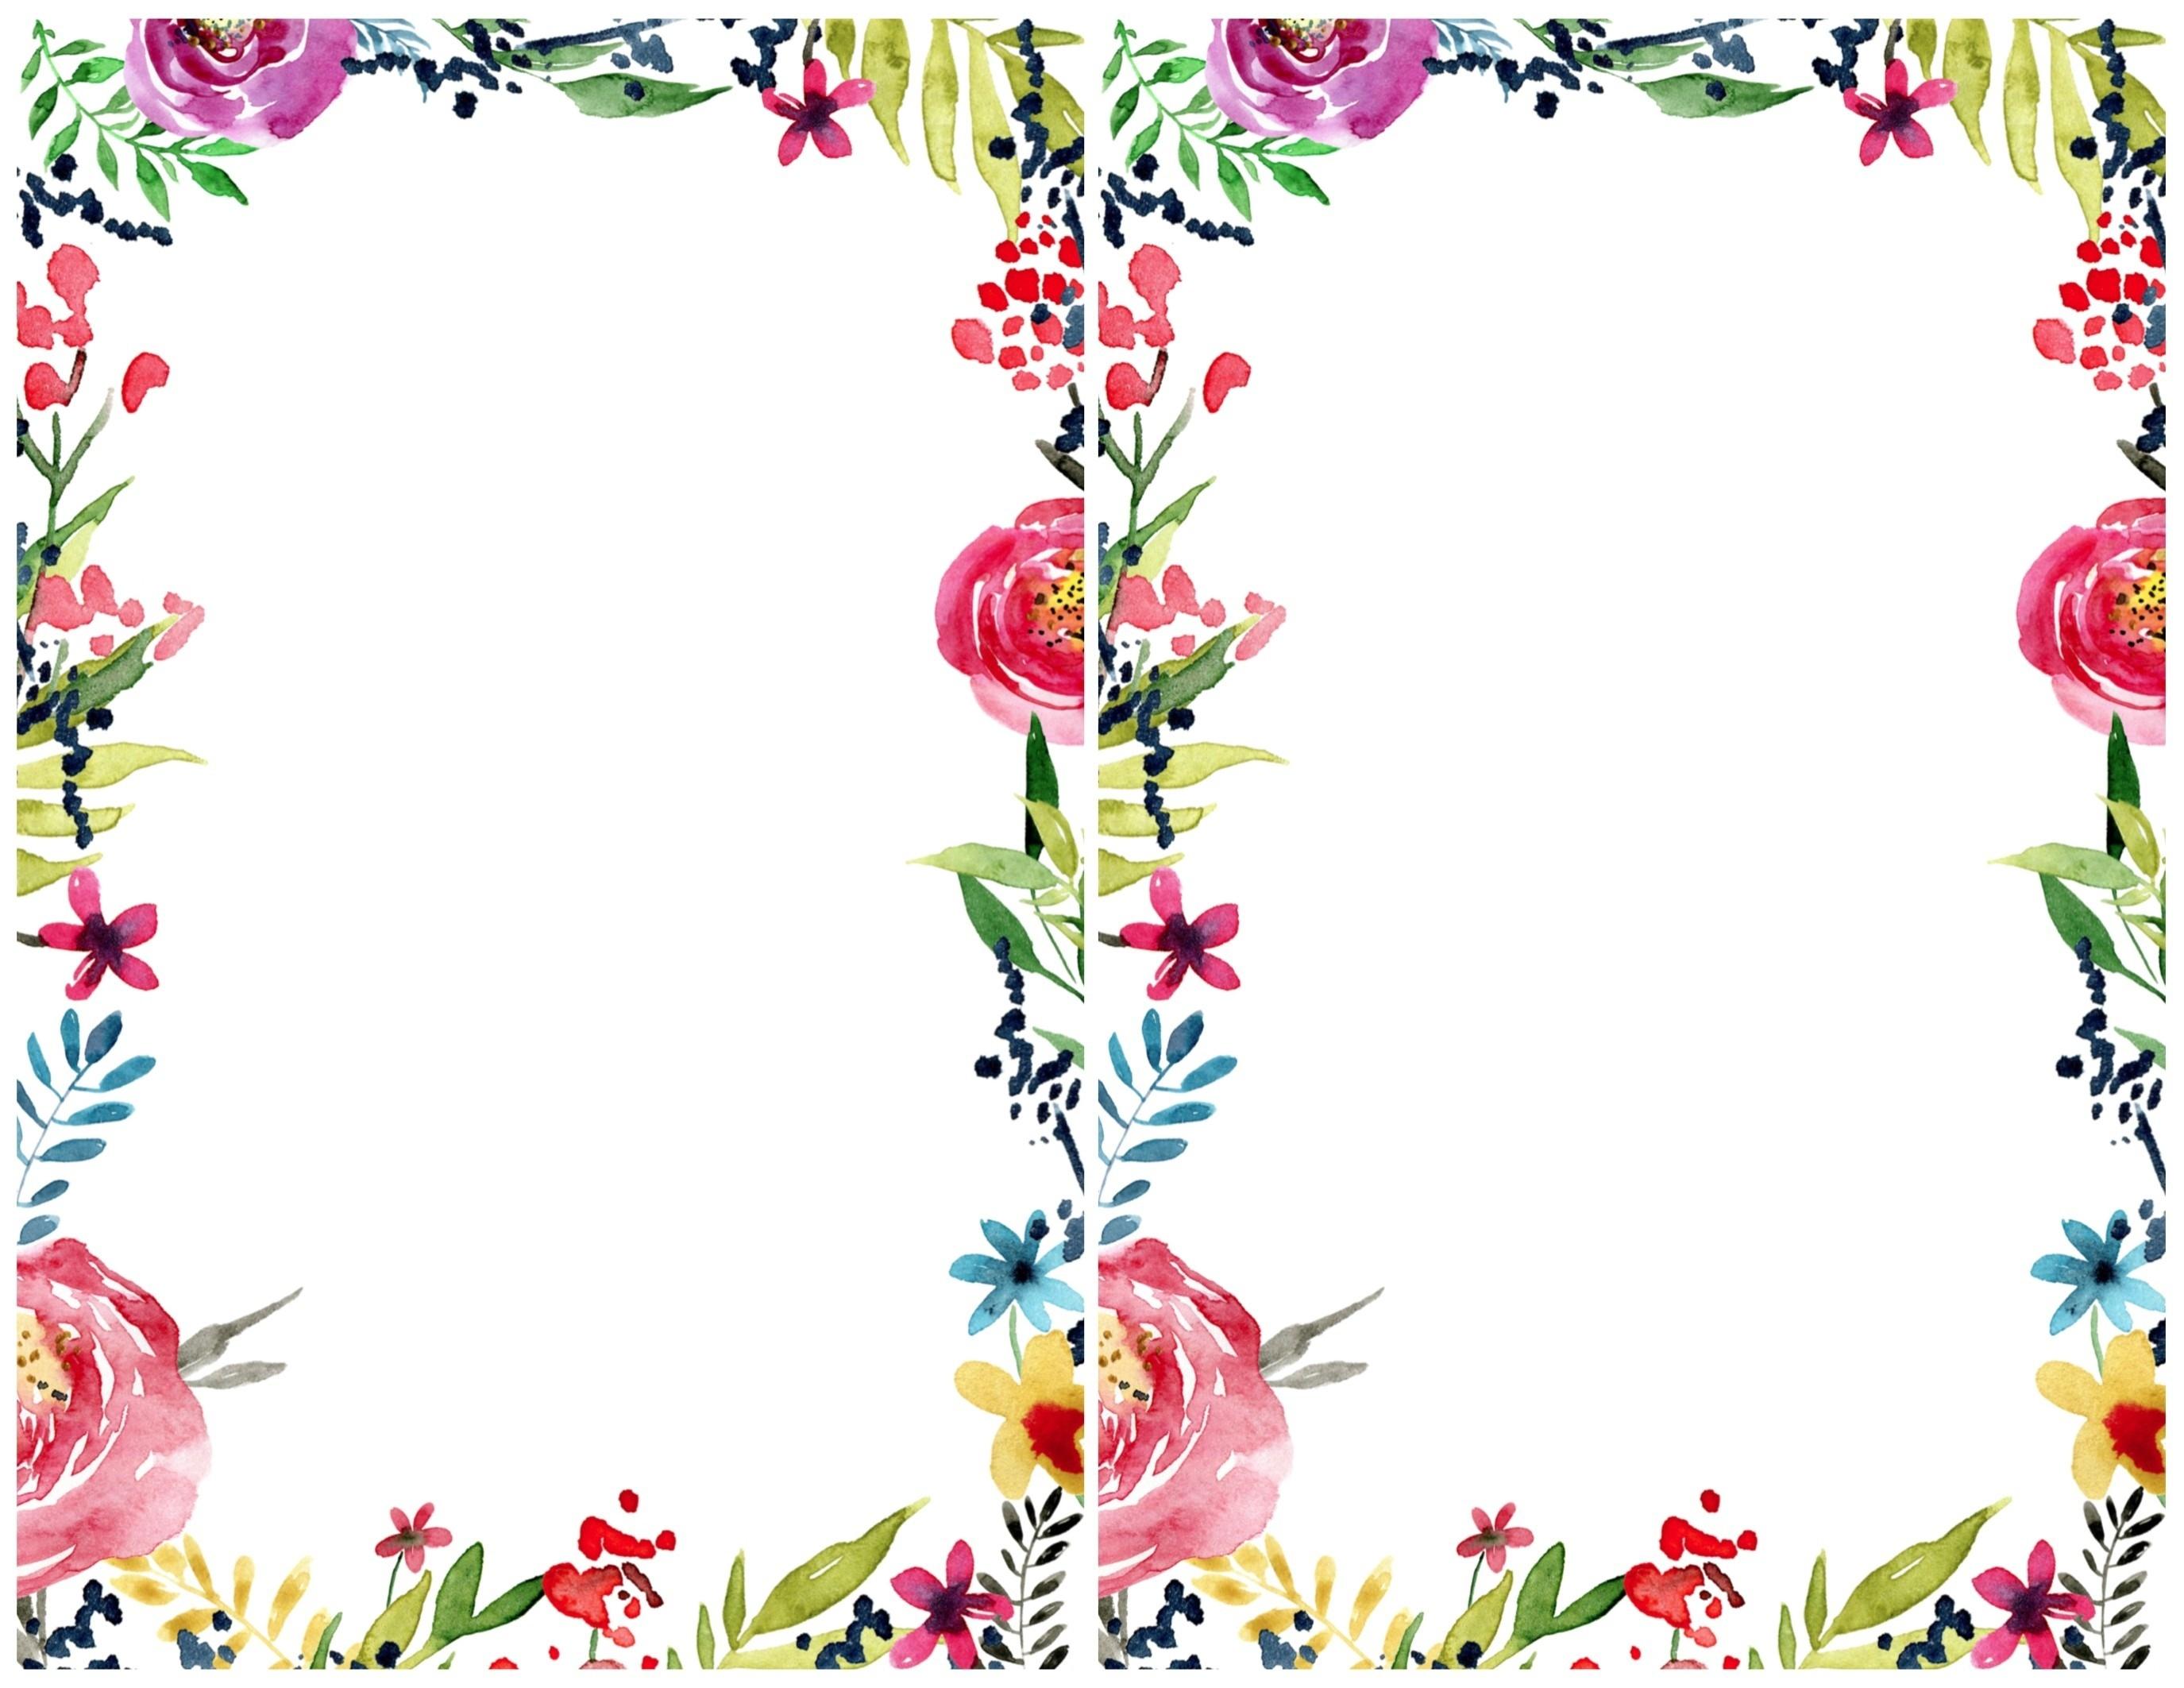 Invitation Templates Free Best Floral Borders Invitations Free - Free Printable Invitations Templates